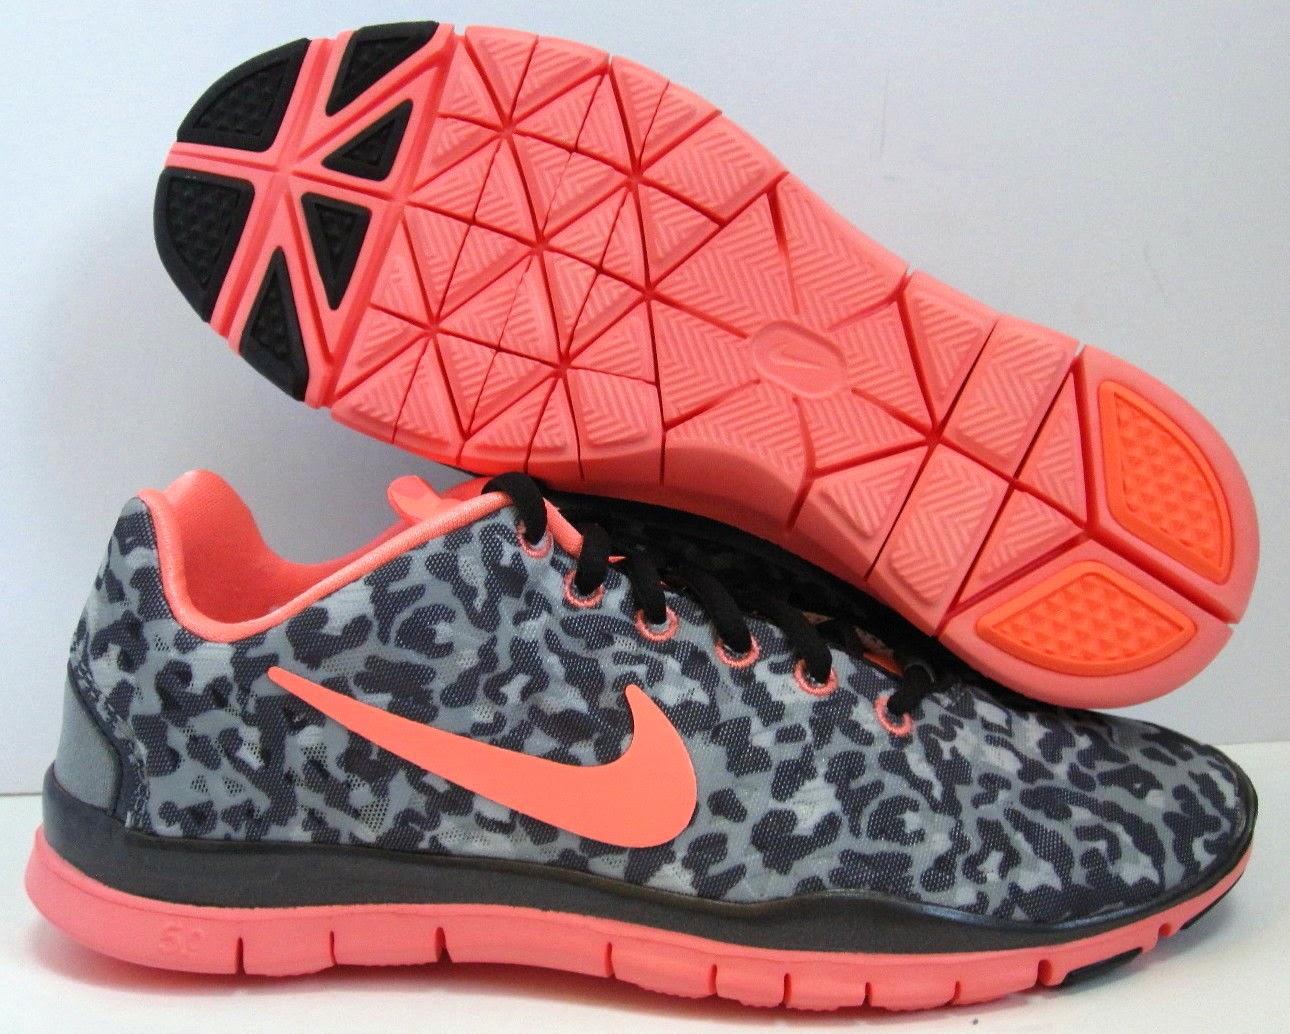 eb224922d63c9c Pink And Gray Jordan 13s